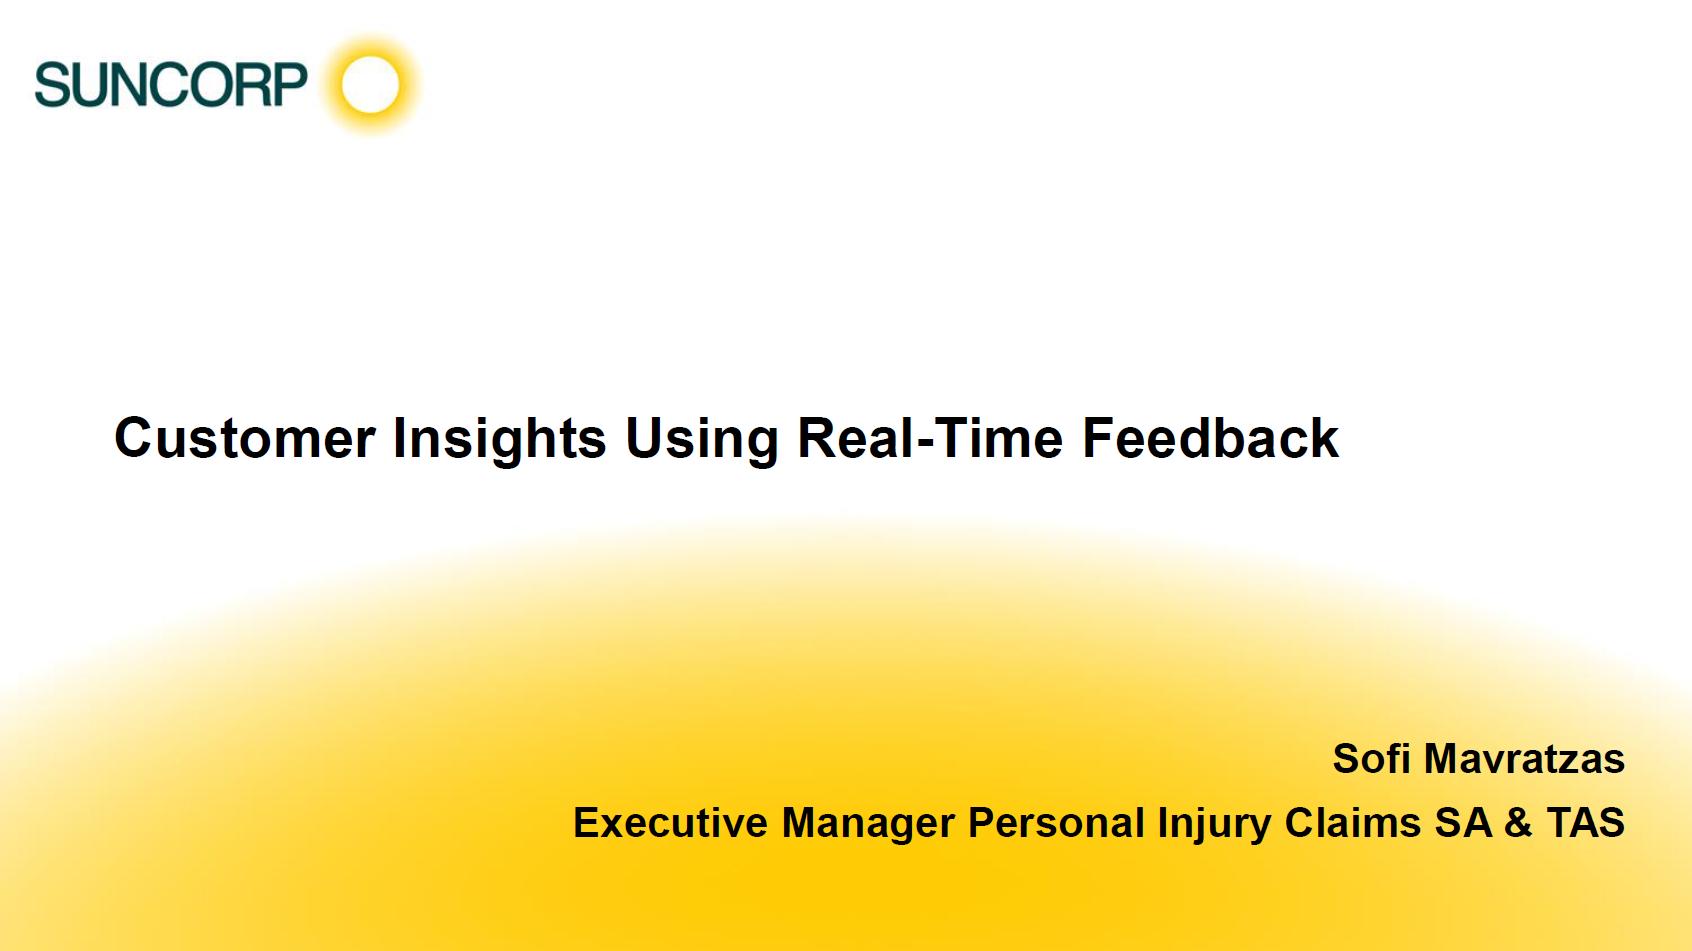 Gaining Customer Insight Using Real-Time Feedback